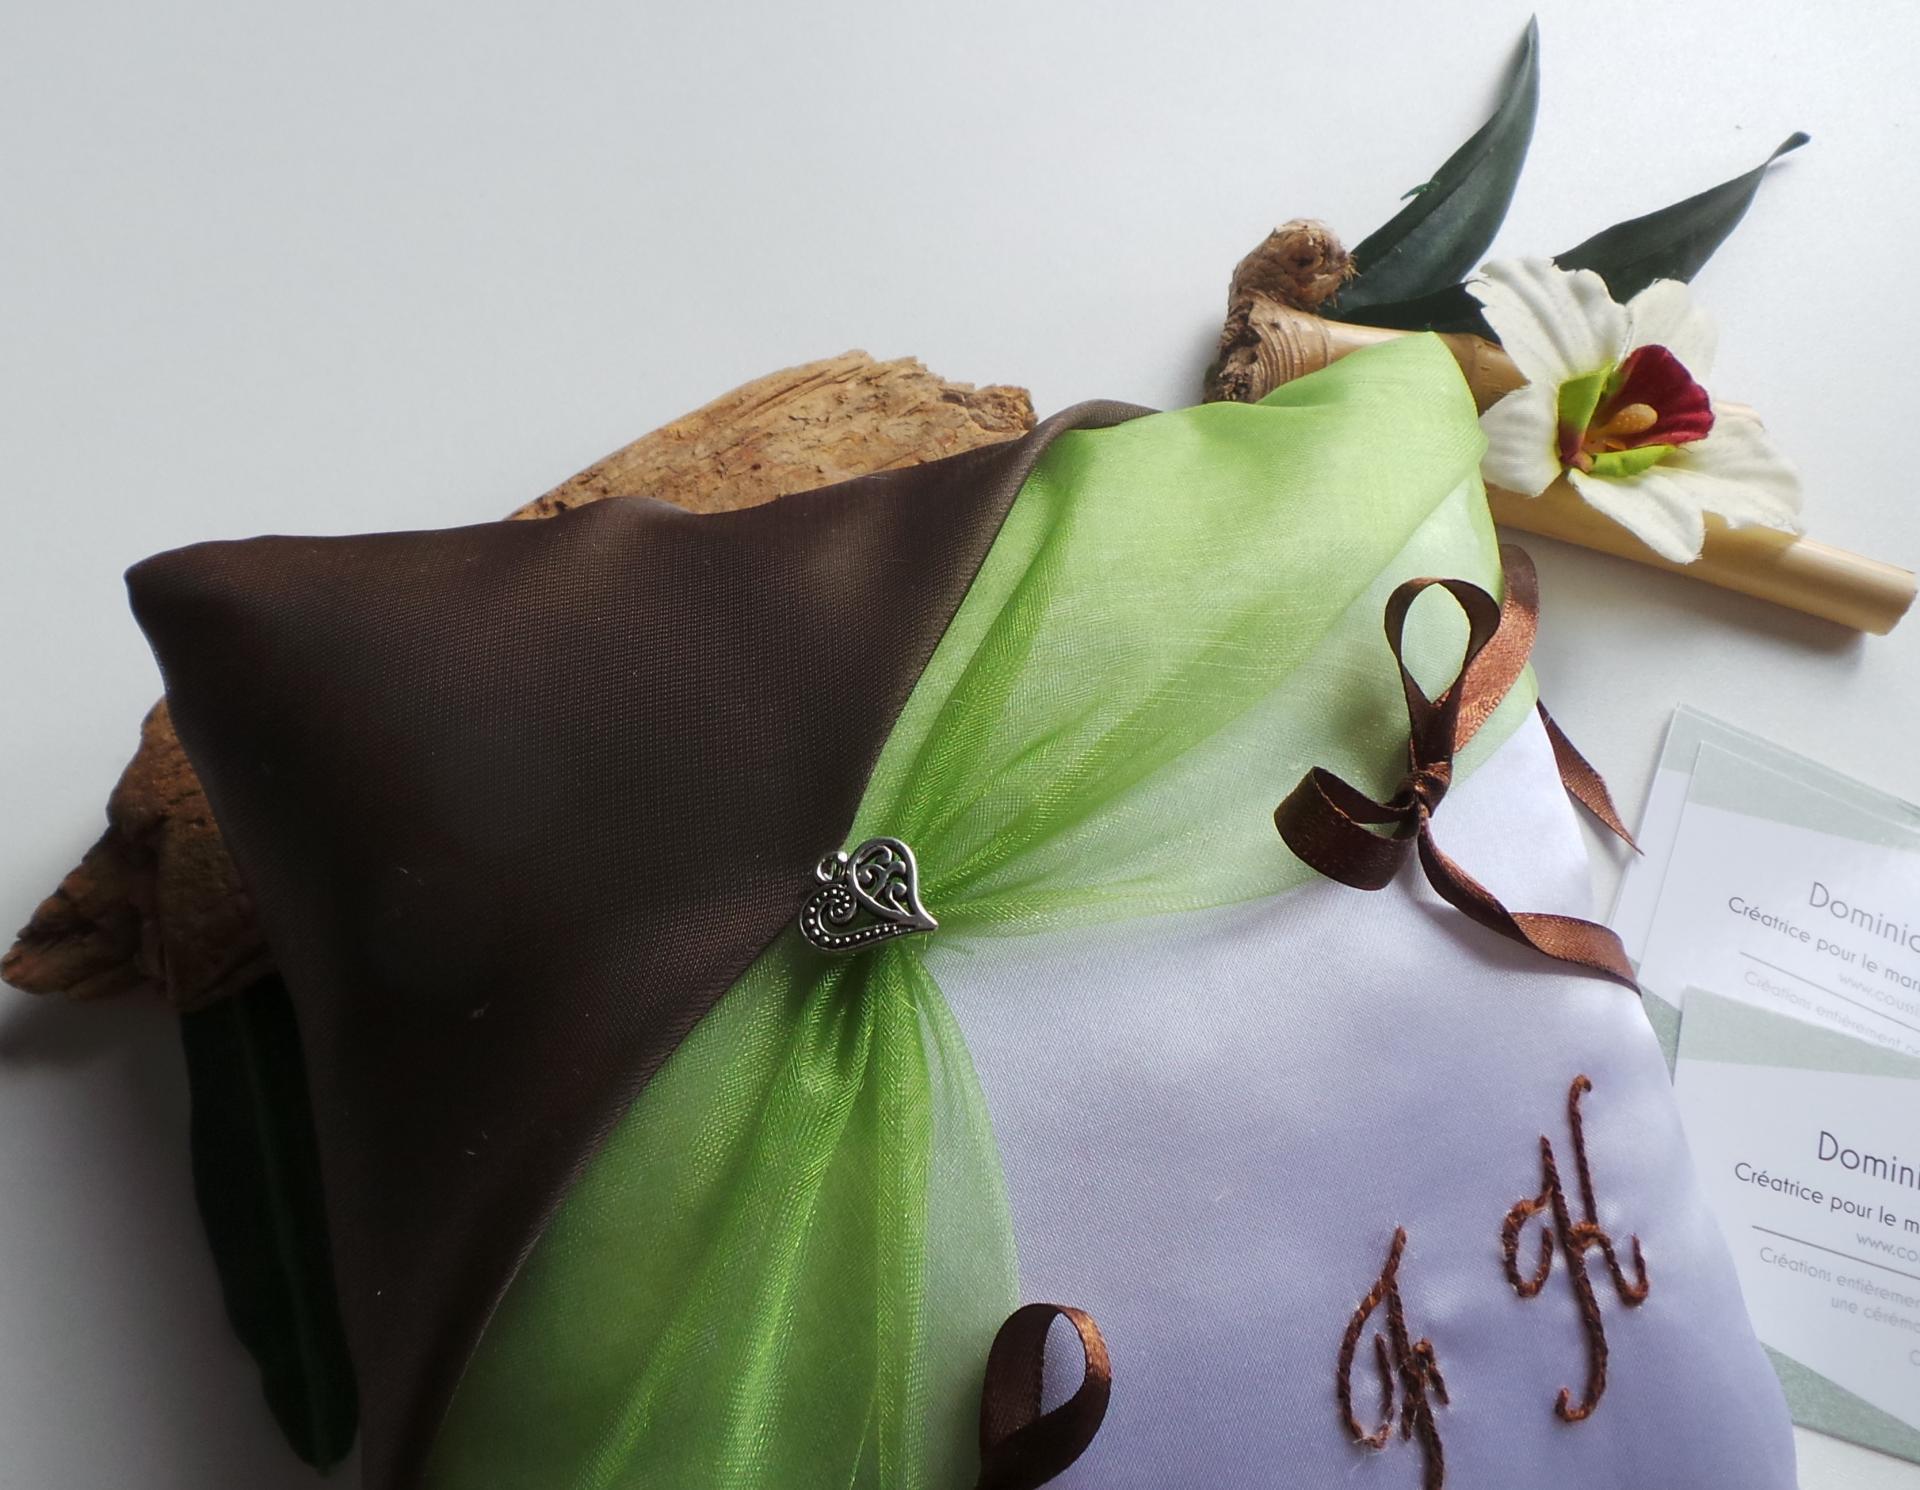 Coussin mariage chocolat anis zen nature fait main